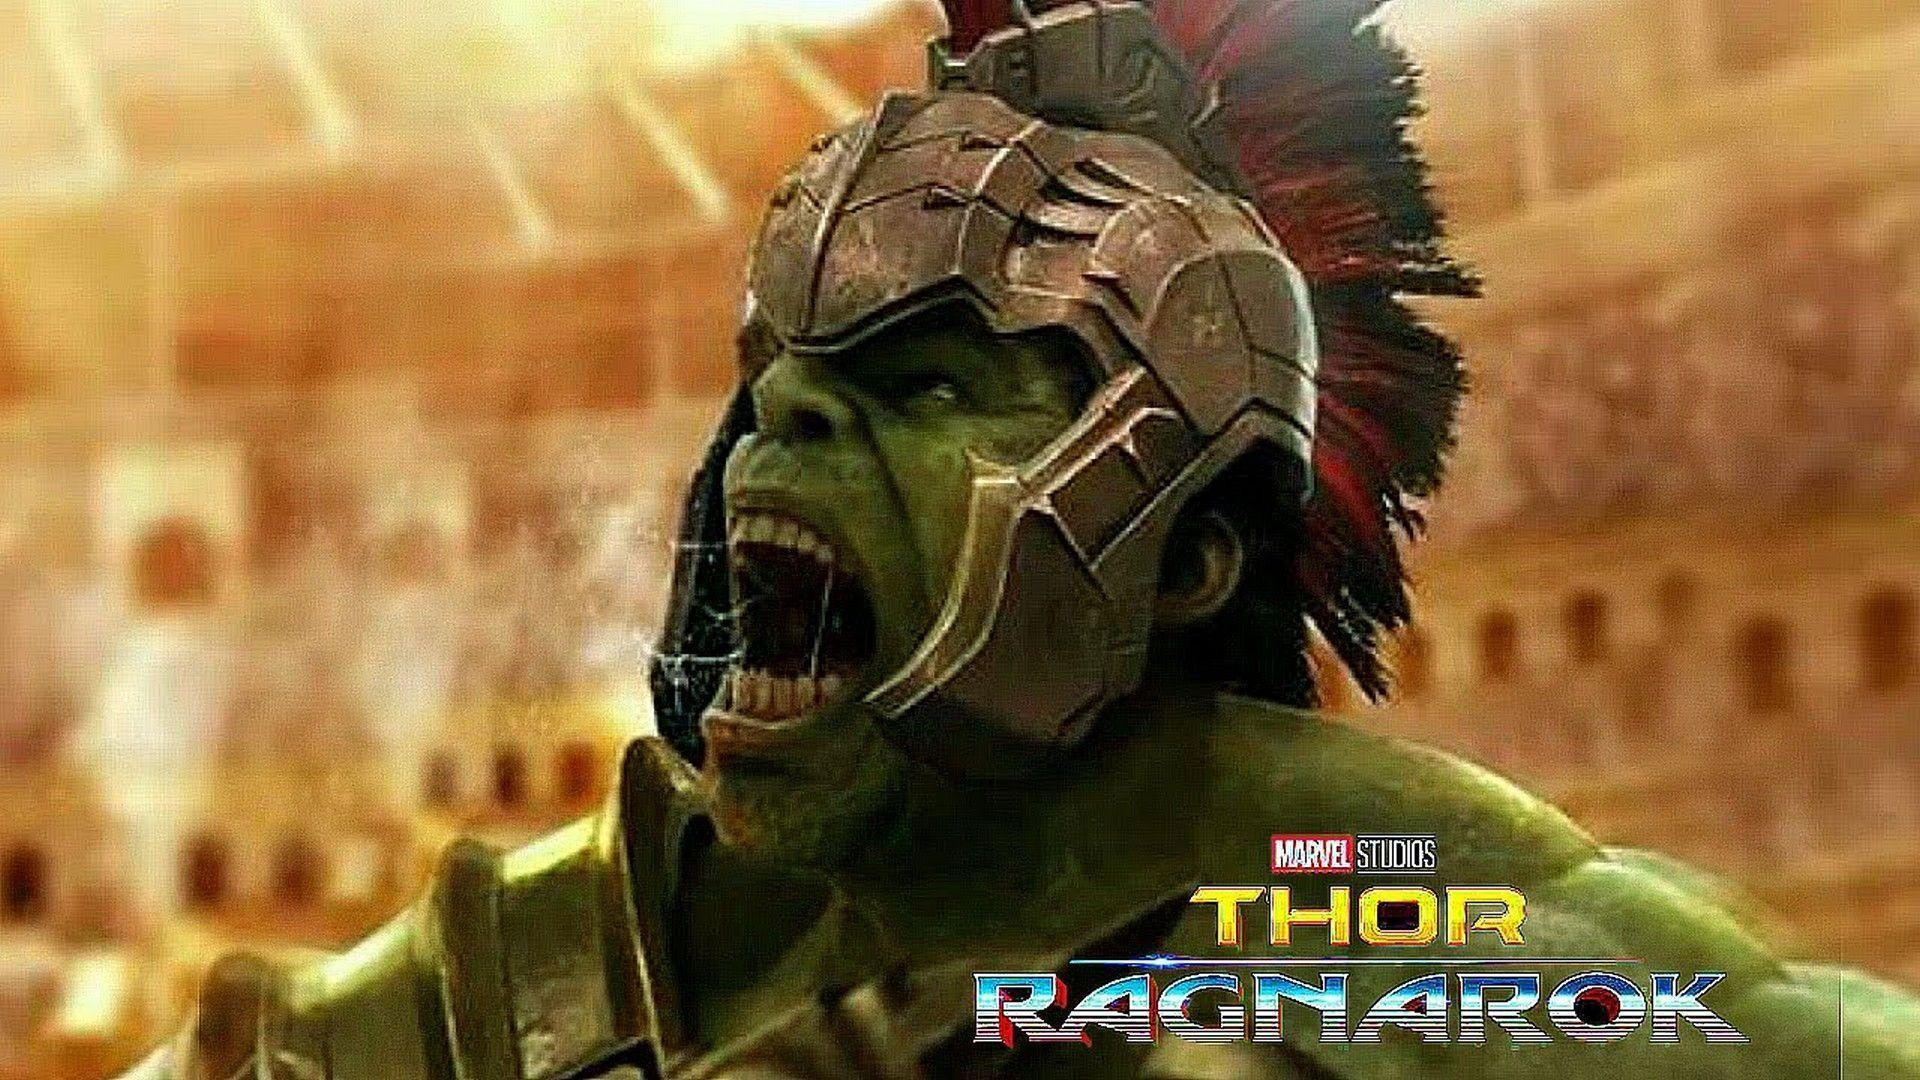 Thor Ragnarok Wallpapers Wallpapertag